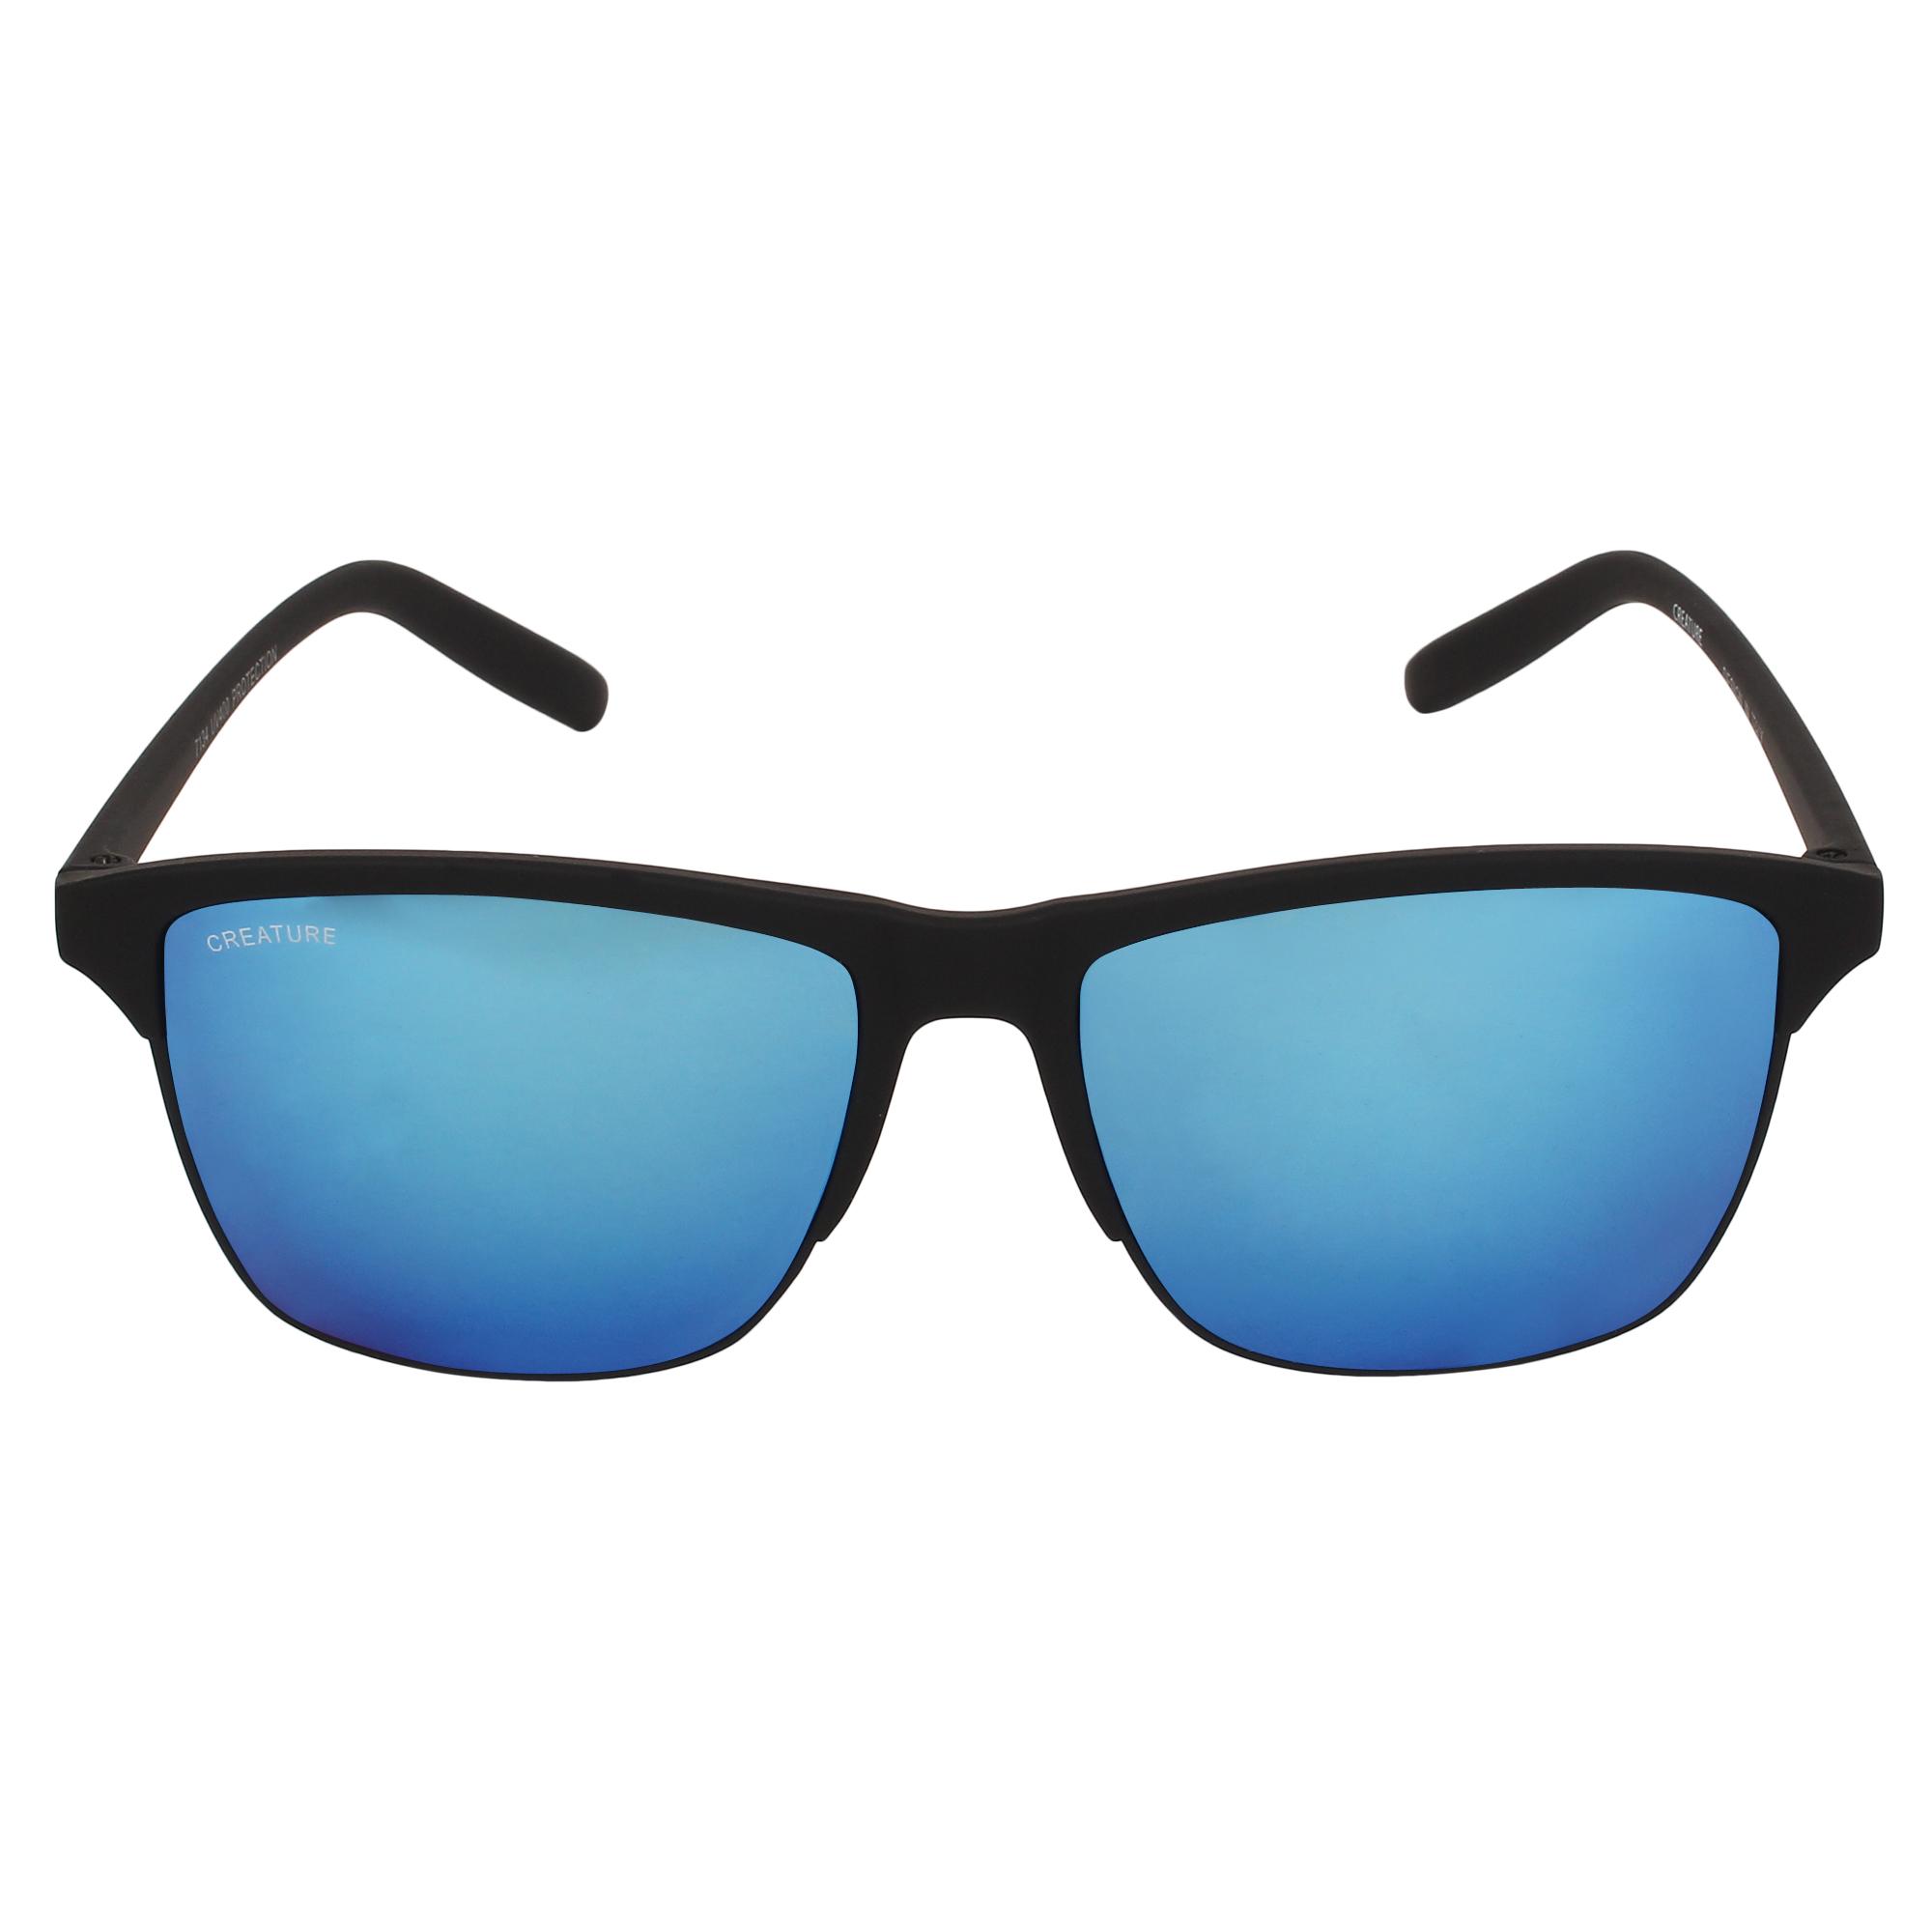 CREATURE   CREATURE Black Sunglasses with UV Protection (Lens-Purple & Blue Frame-Black)